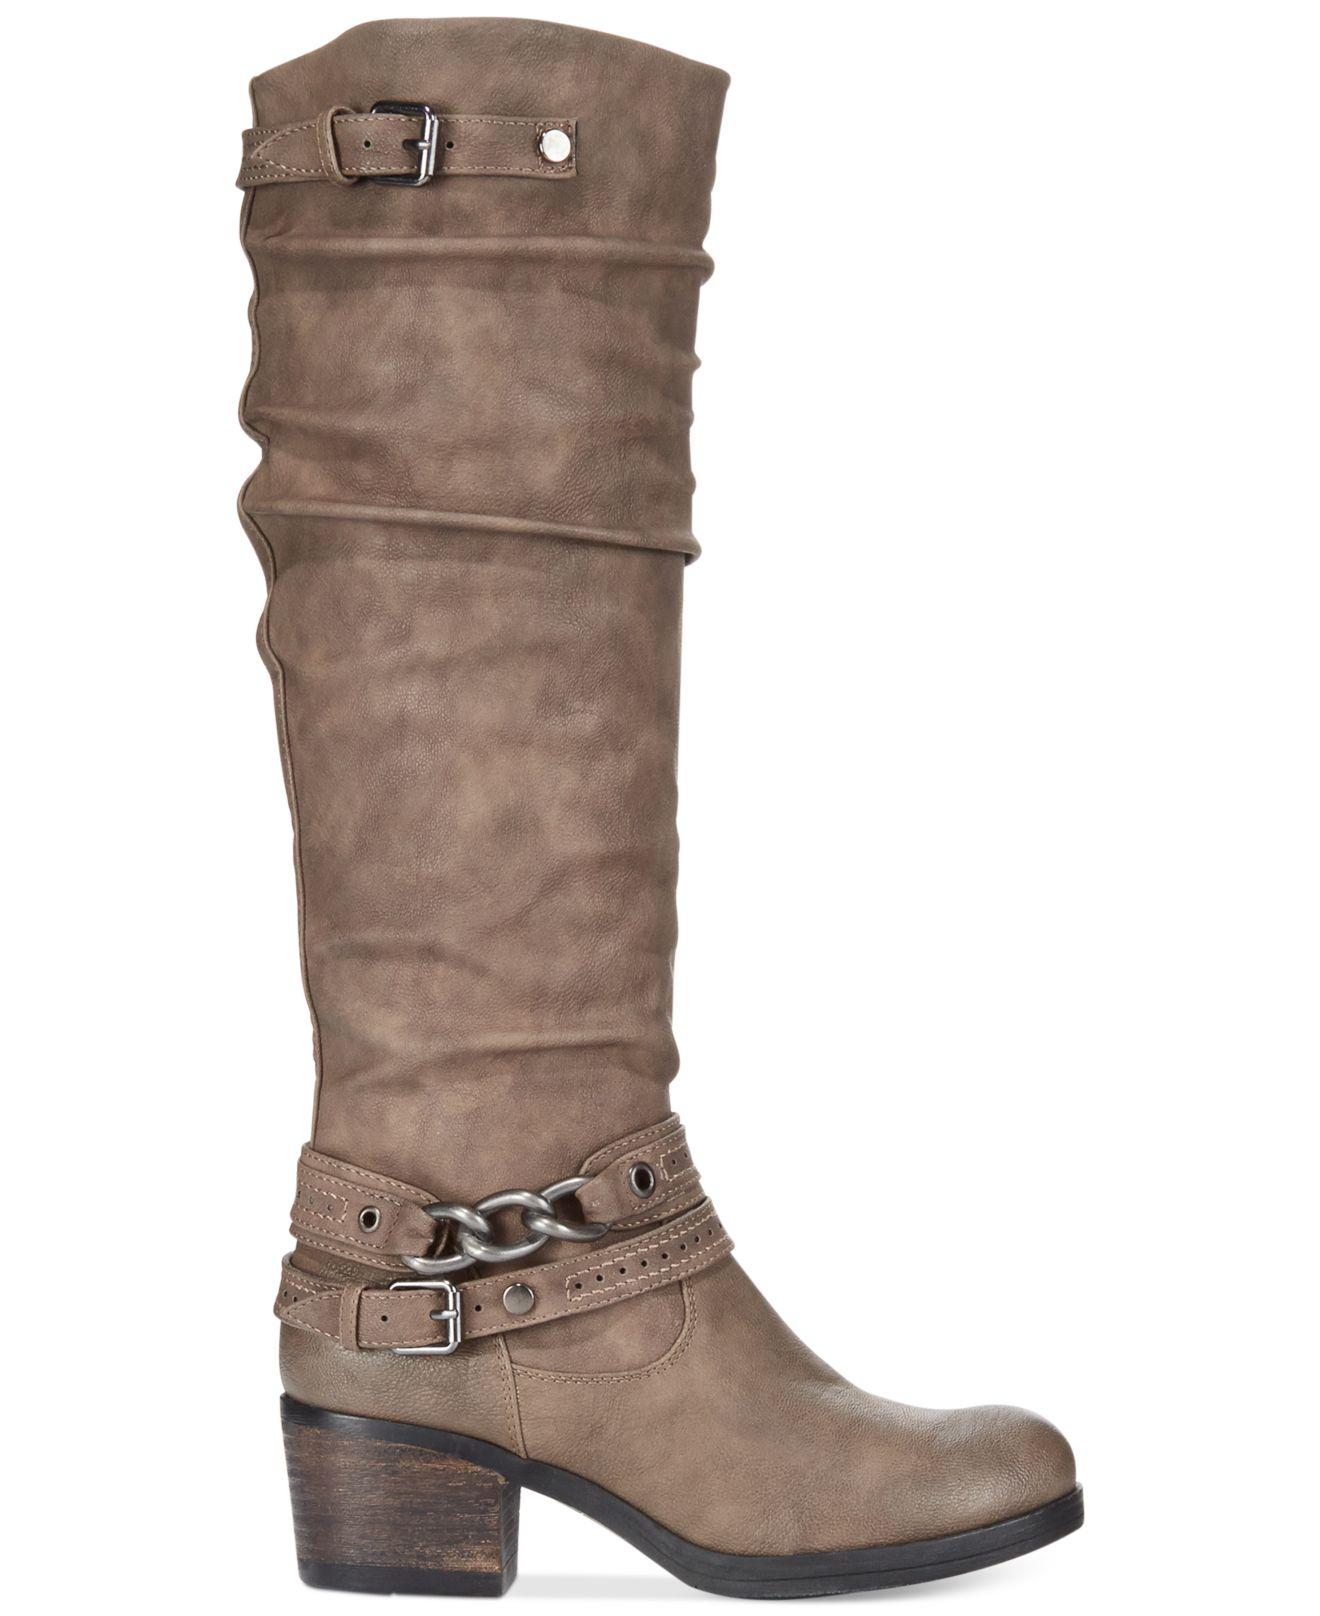 carlos by carlos santana wide calf boots in brown